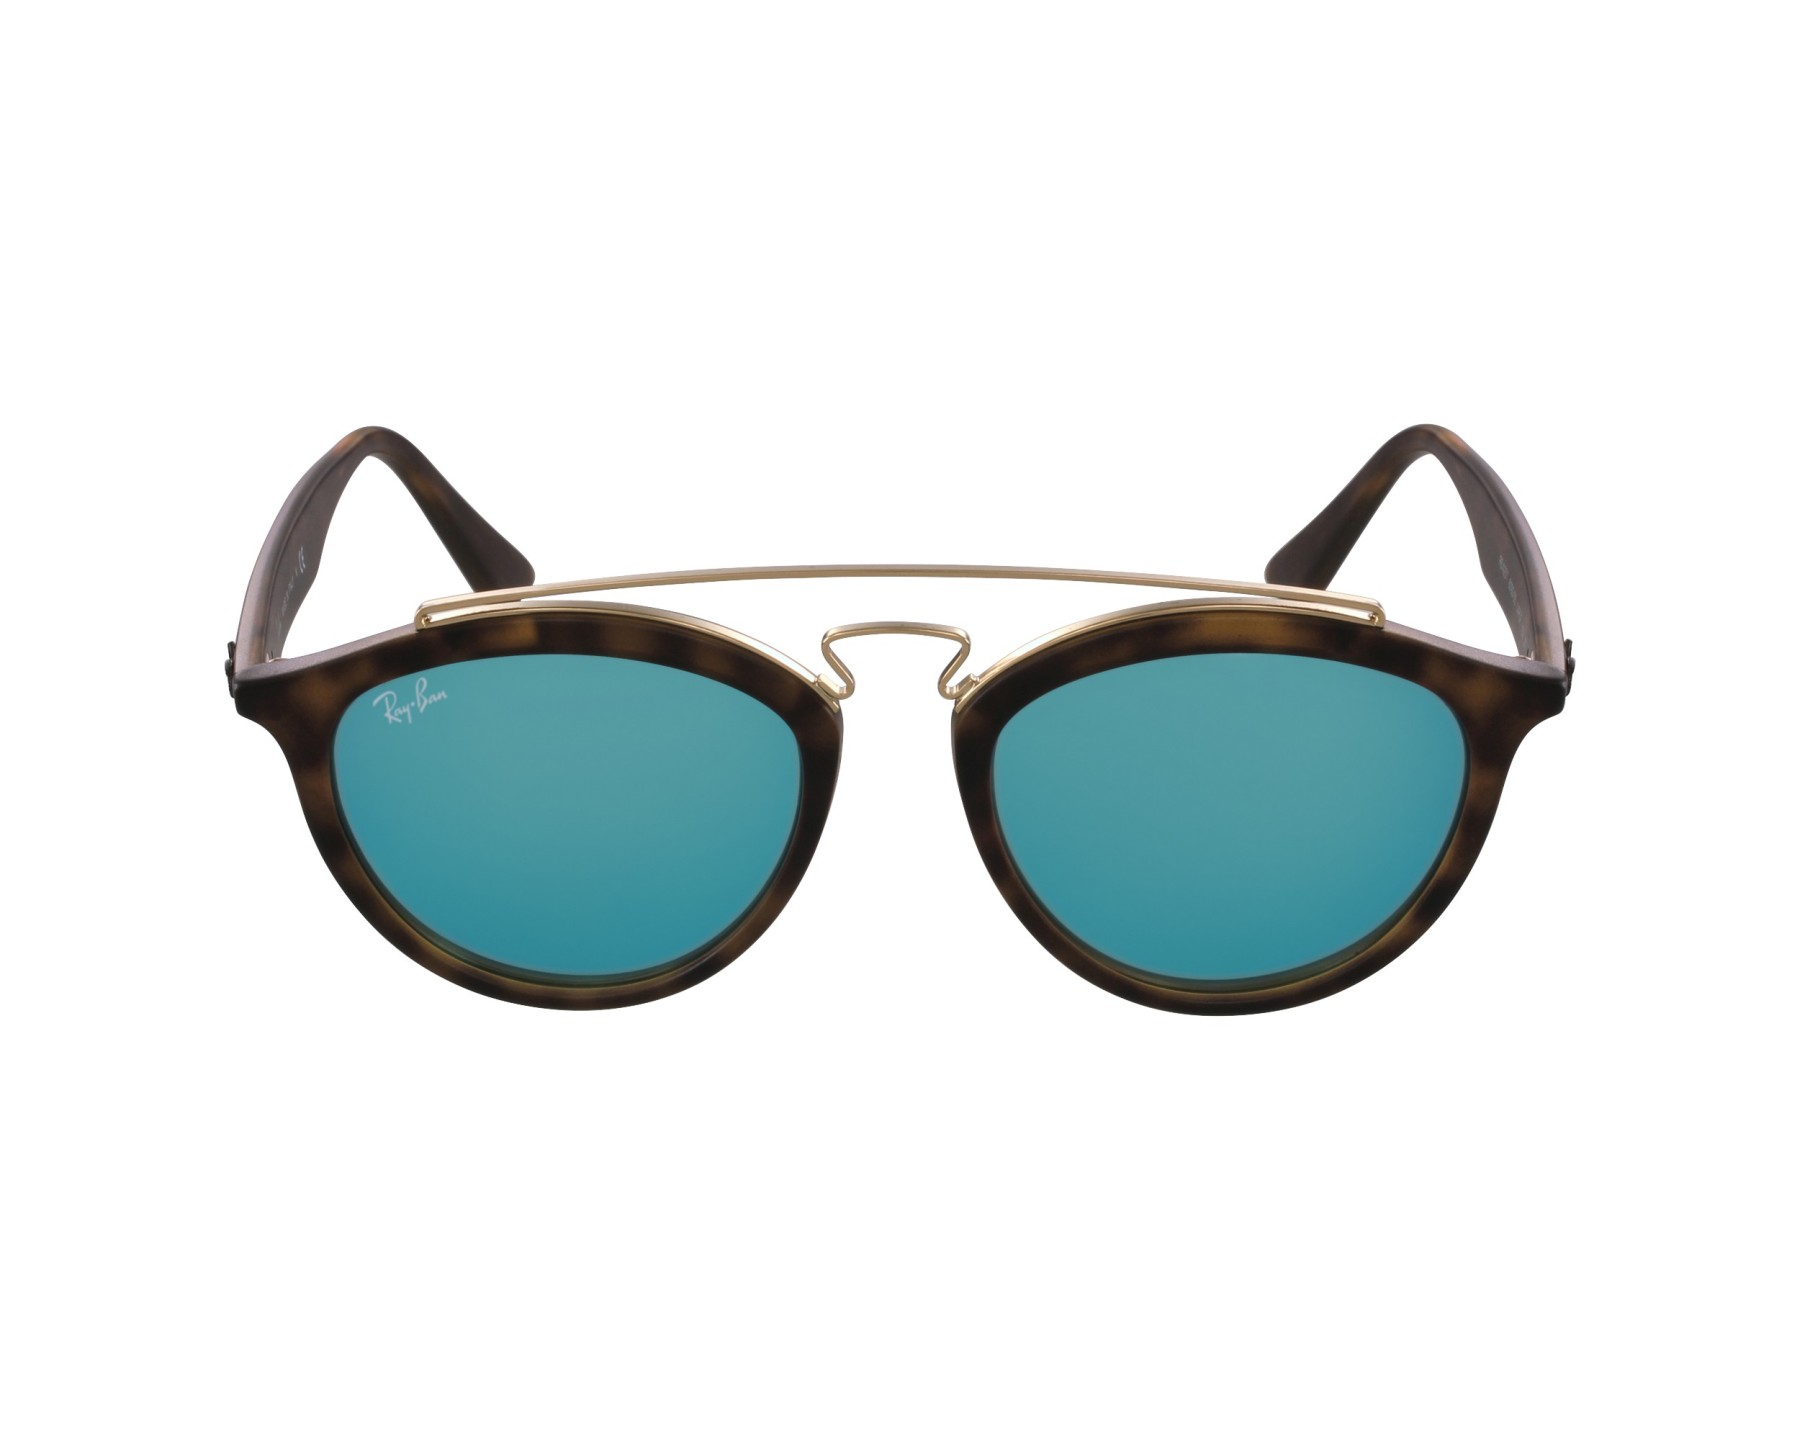 1d611edb03 Sunglasses Ray-Ban RB-4257 6092 55 50-19 Havana Gold profile